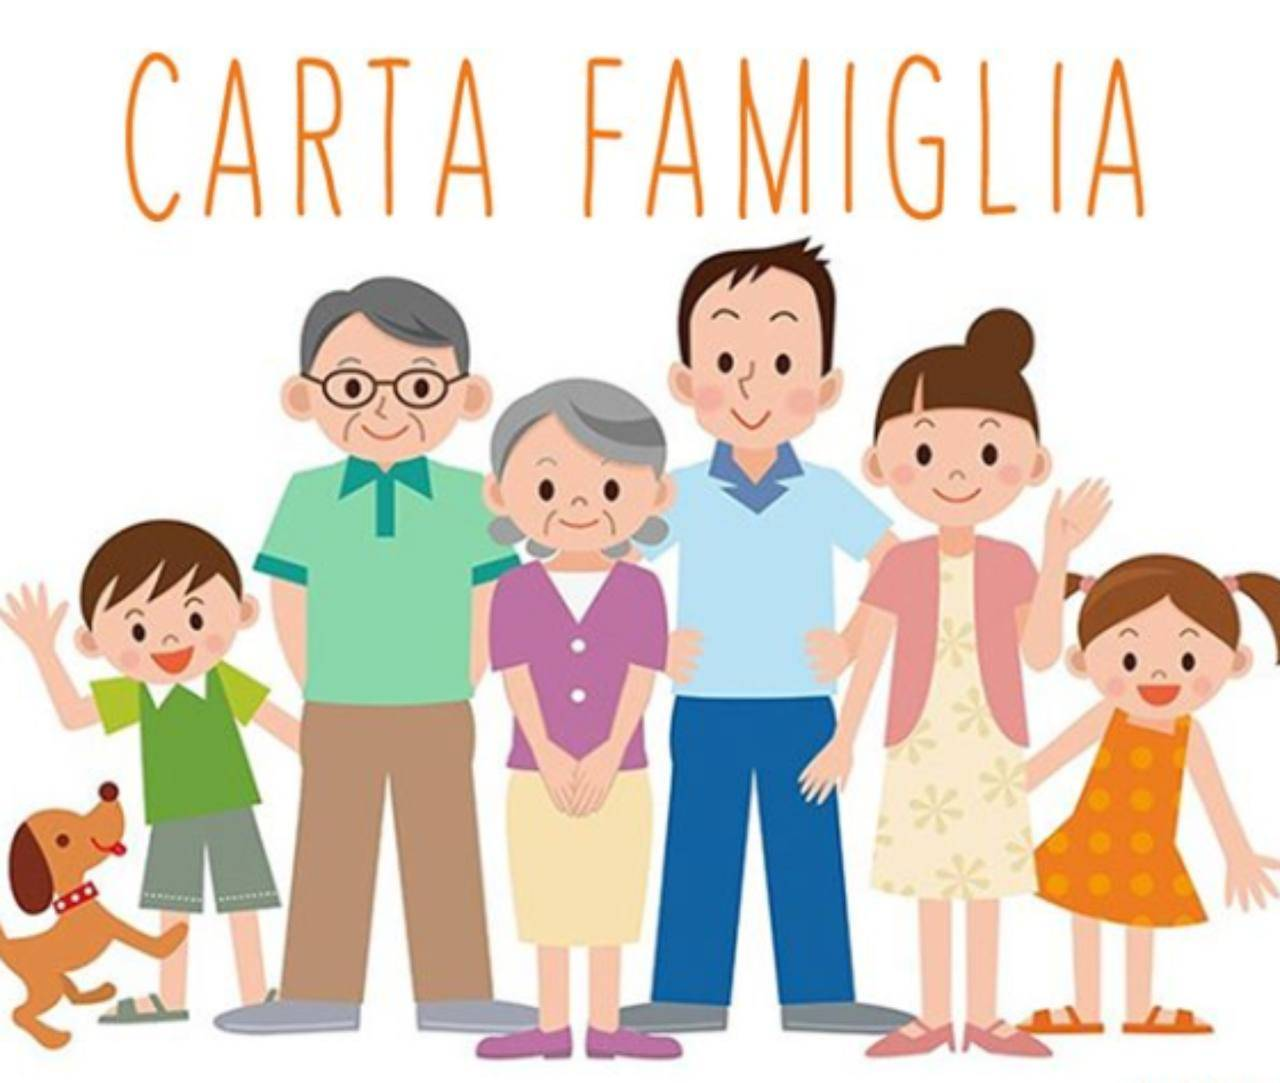 Carta famiglia 2020